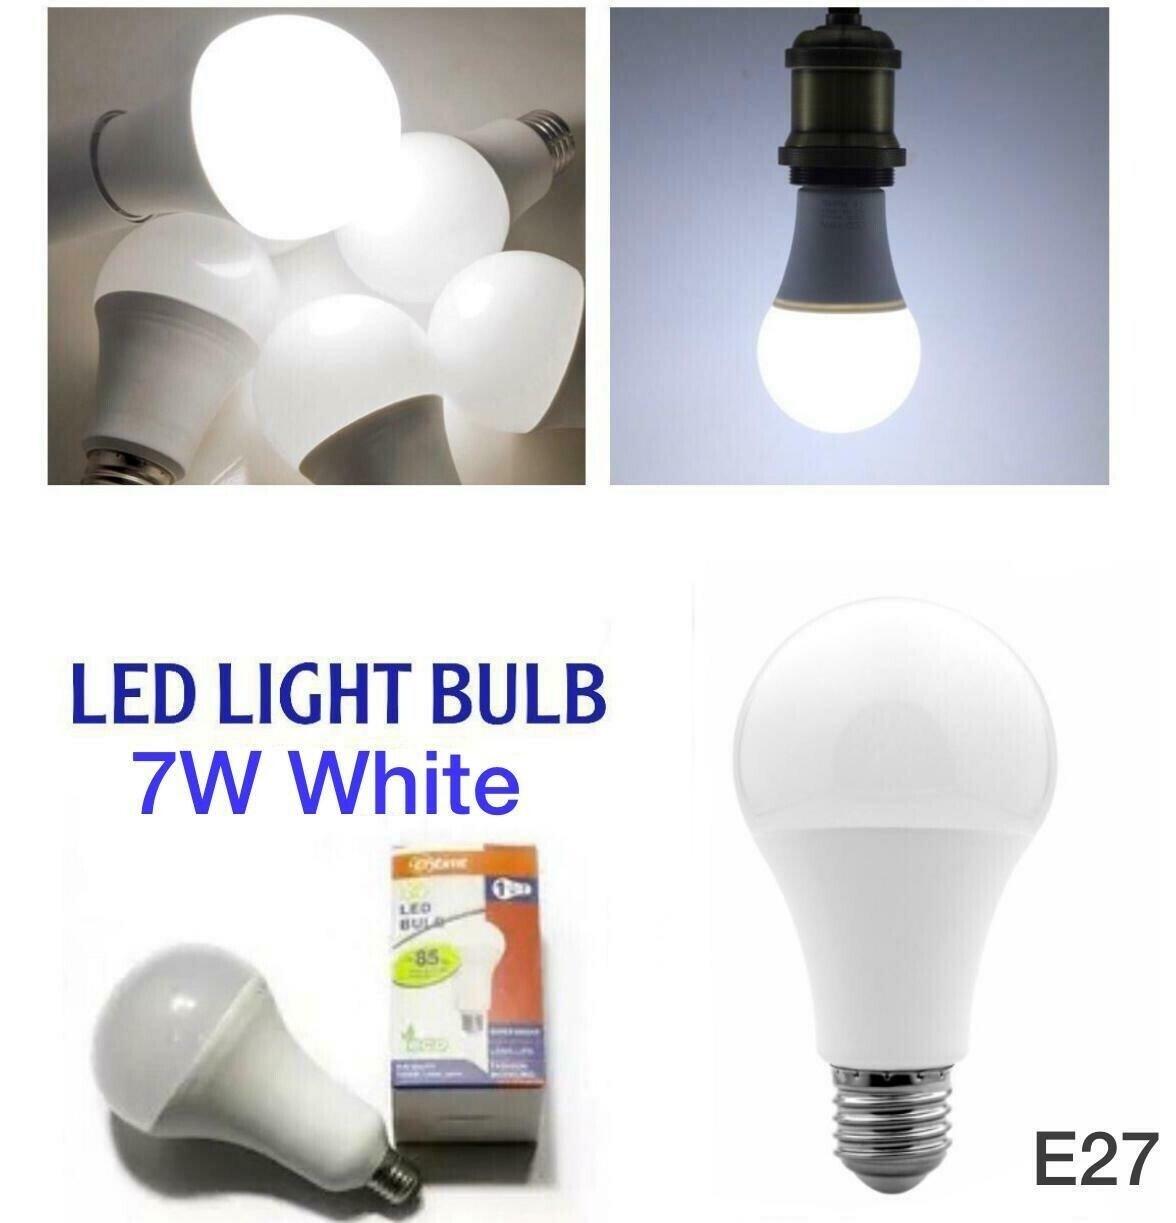 LED Bulb (white 7W)